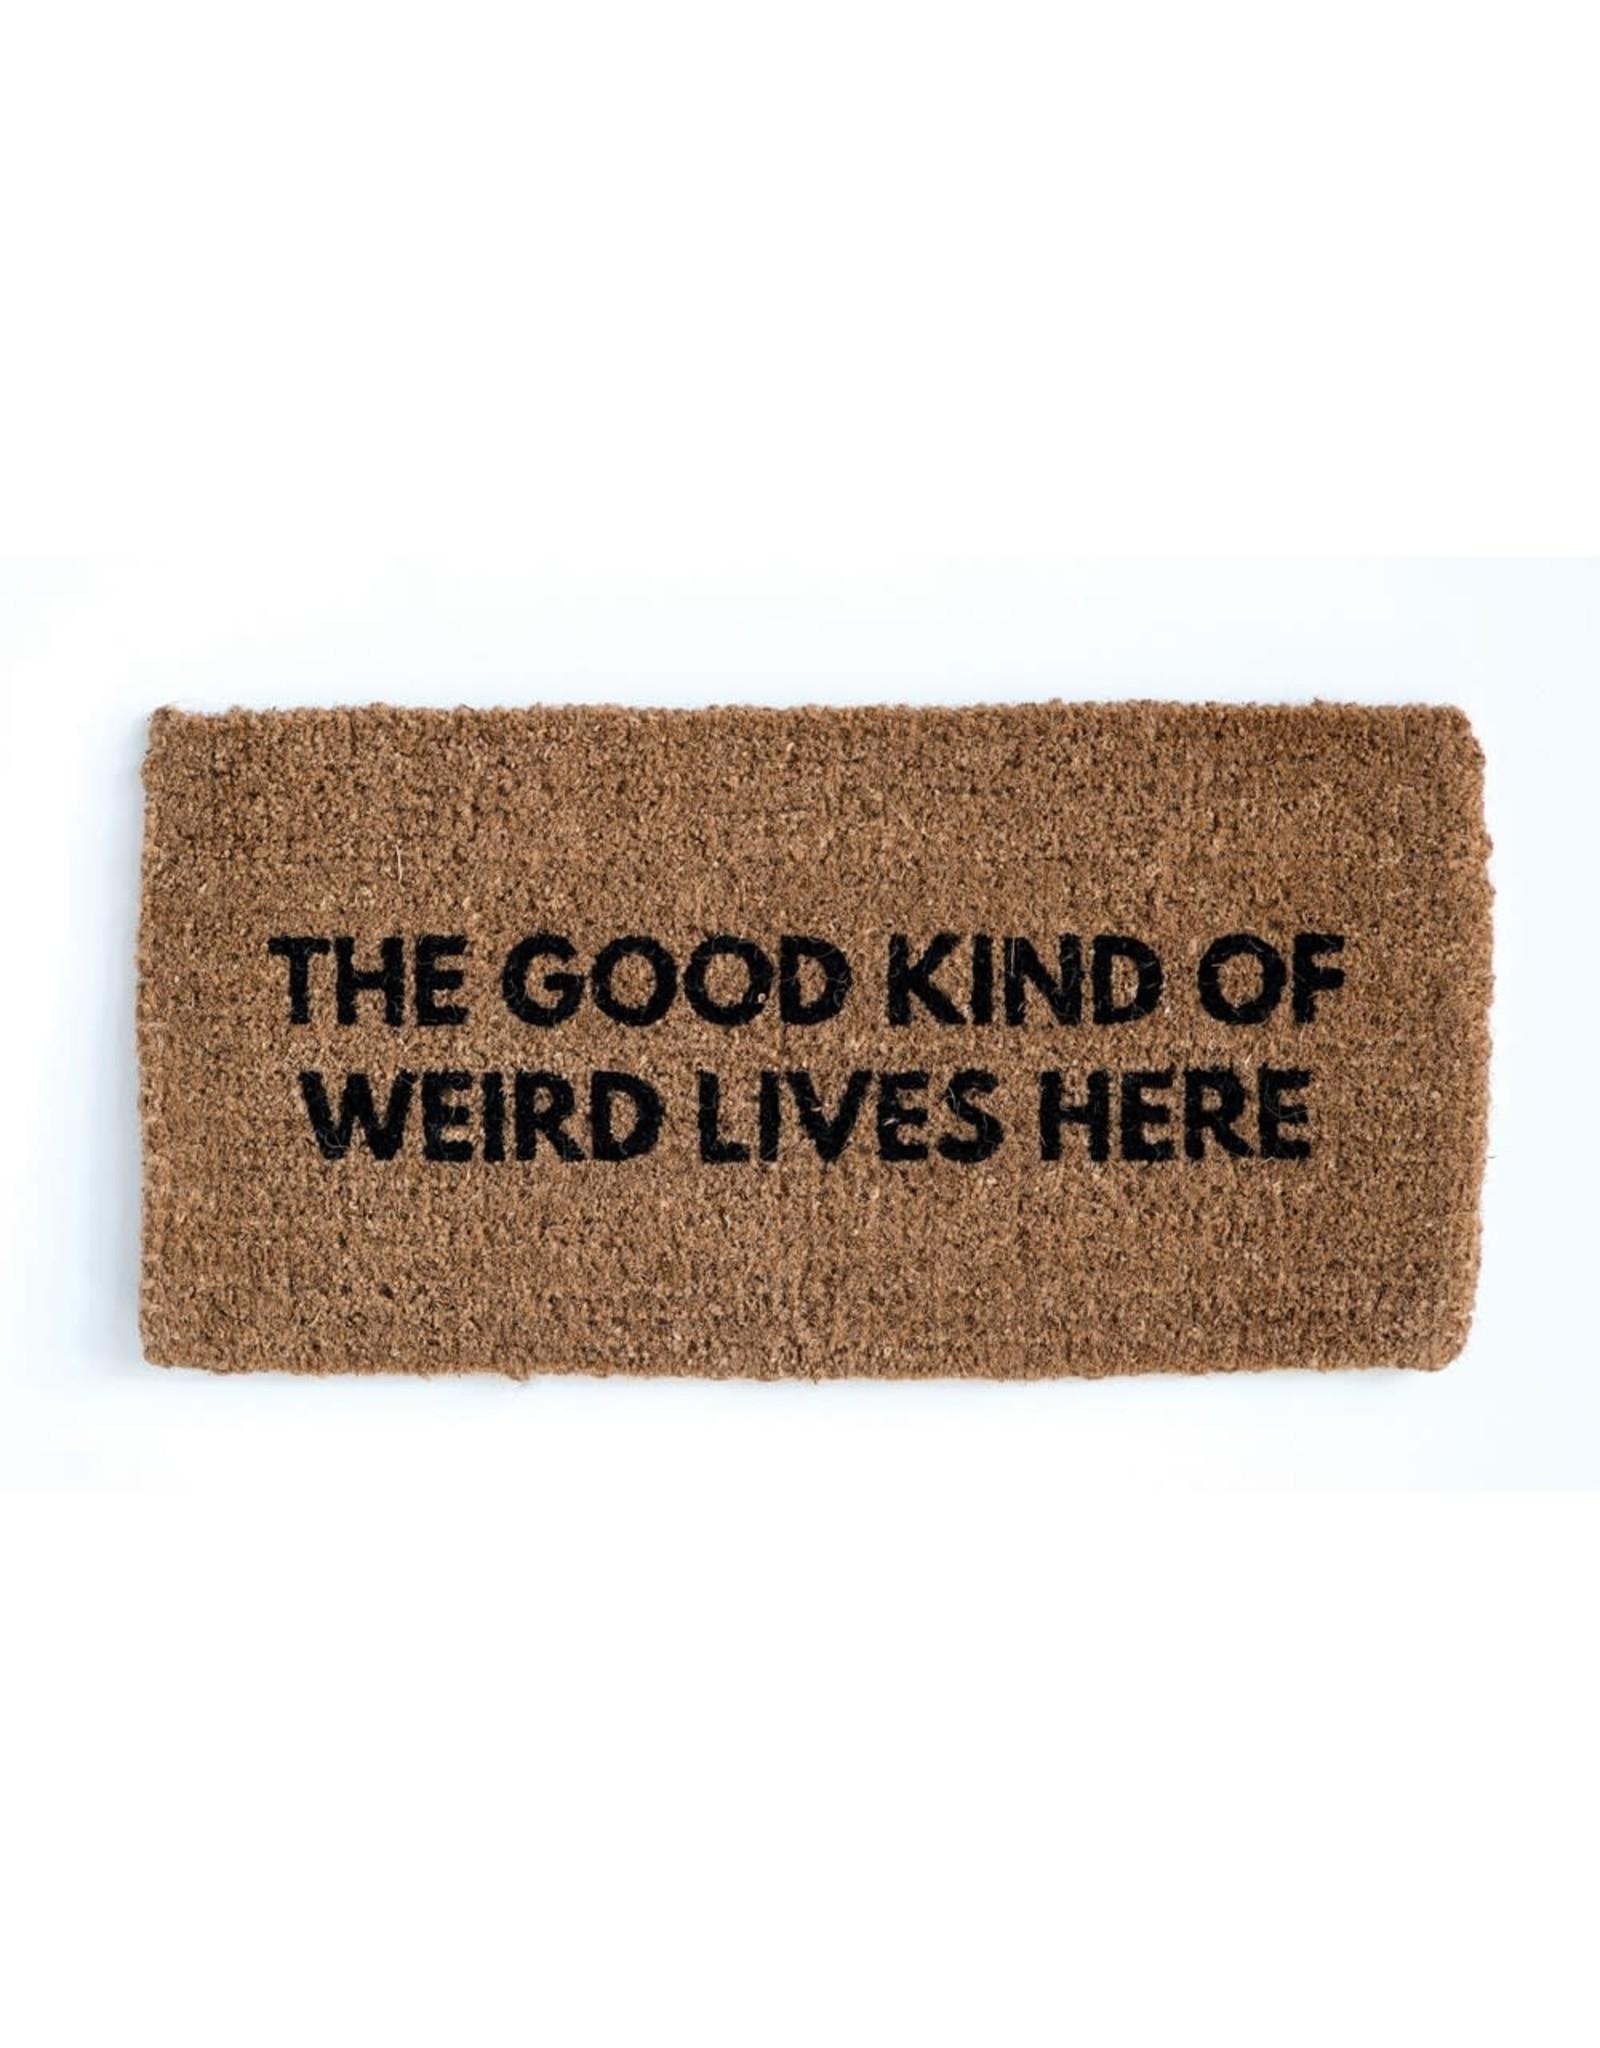 Creative Co-op The Good Kind of Weird Lives Here Doormat